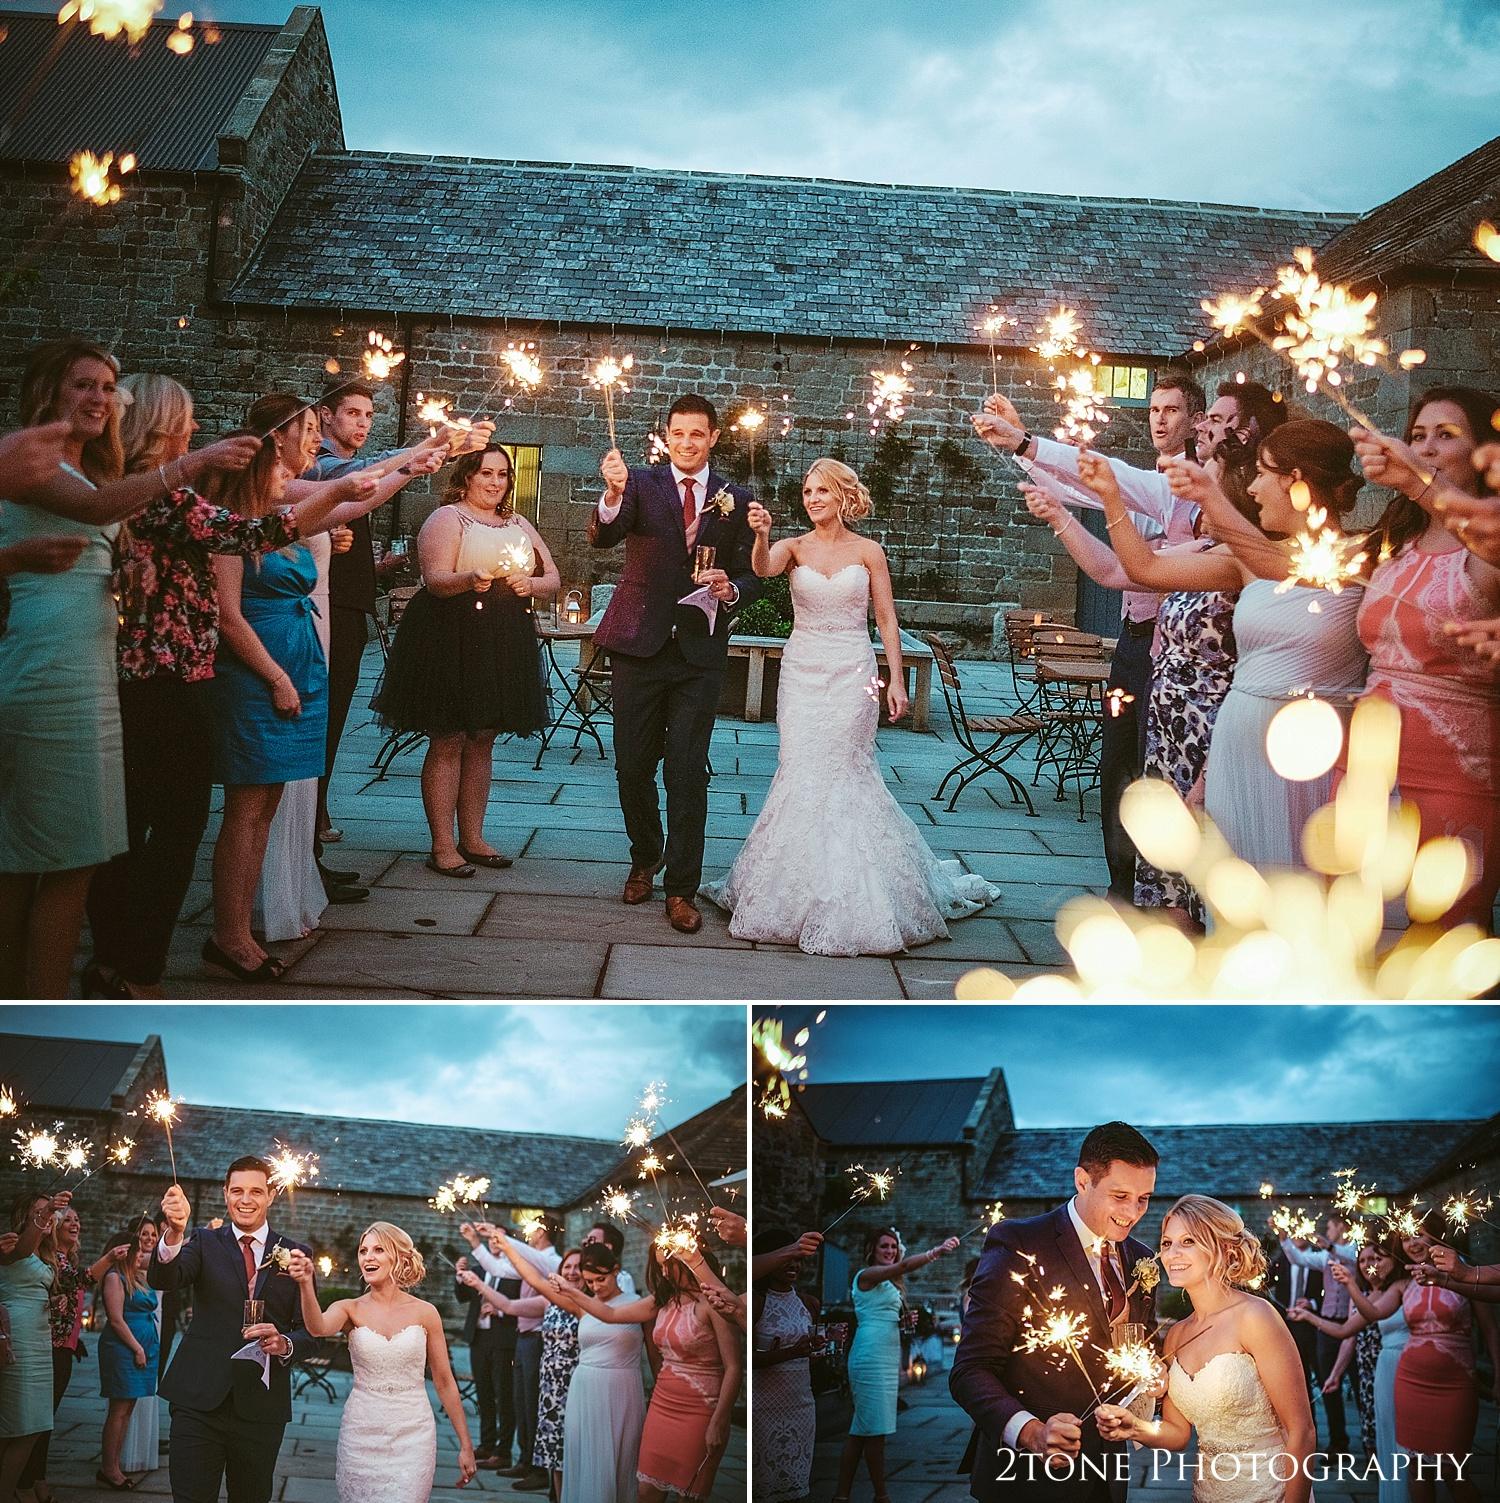 Wedding sparklers by wedding photography team, 2tone Photography www.2tonephotography.co.uk